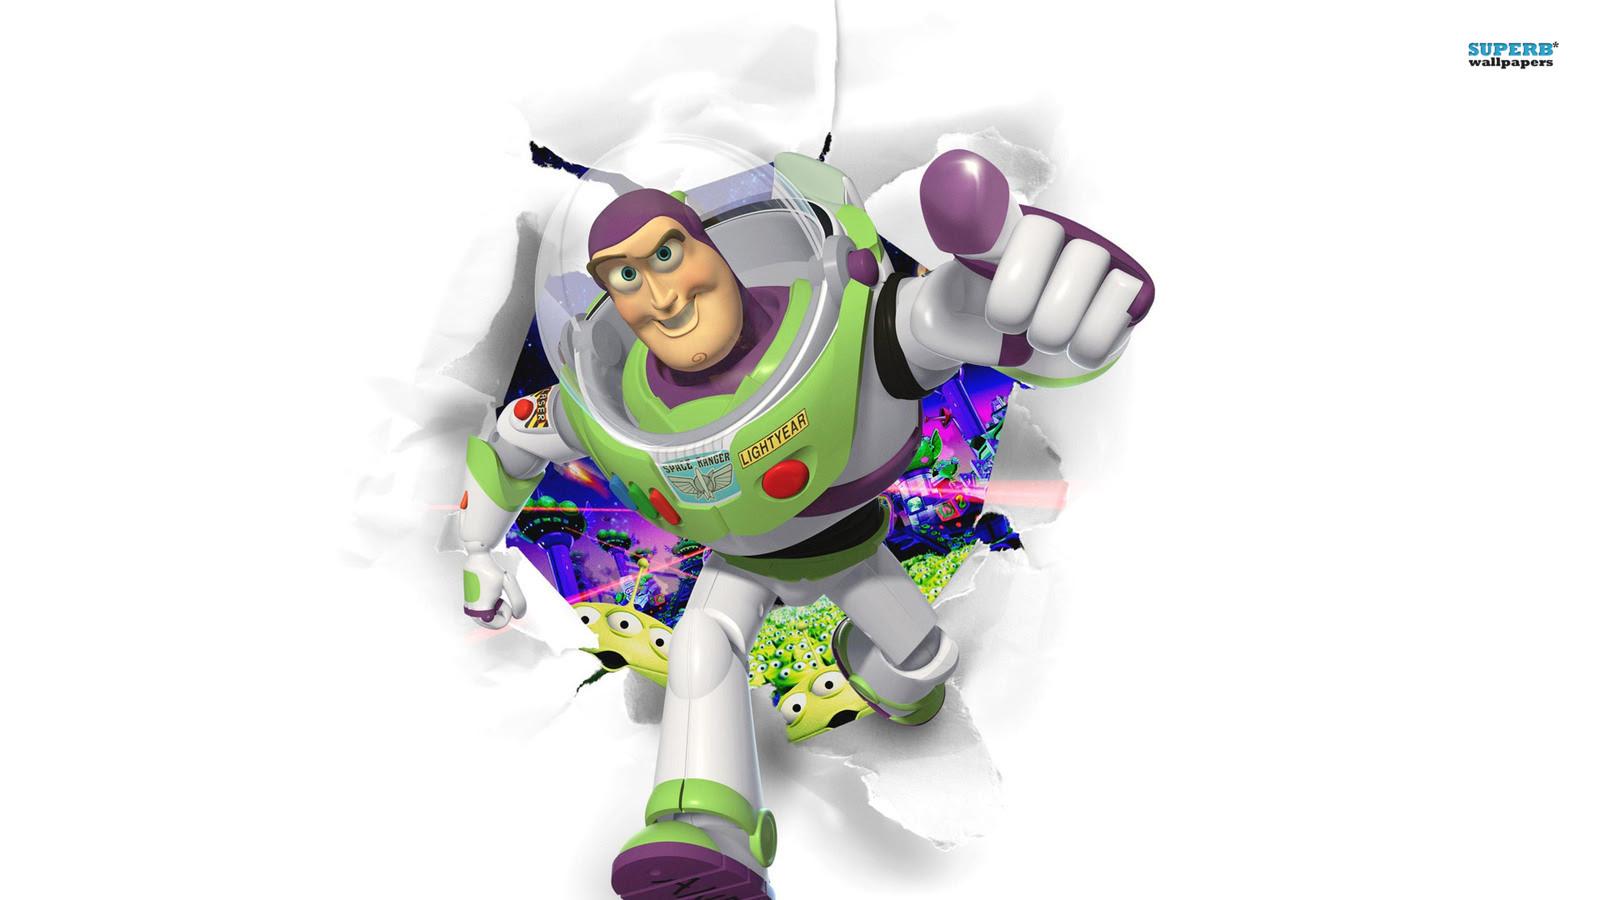 Toy Story ディズニー 壁紙 38709394 ファンポップ